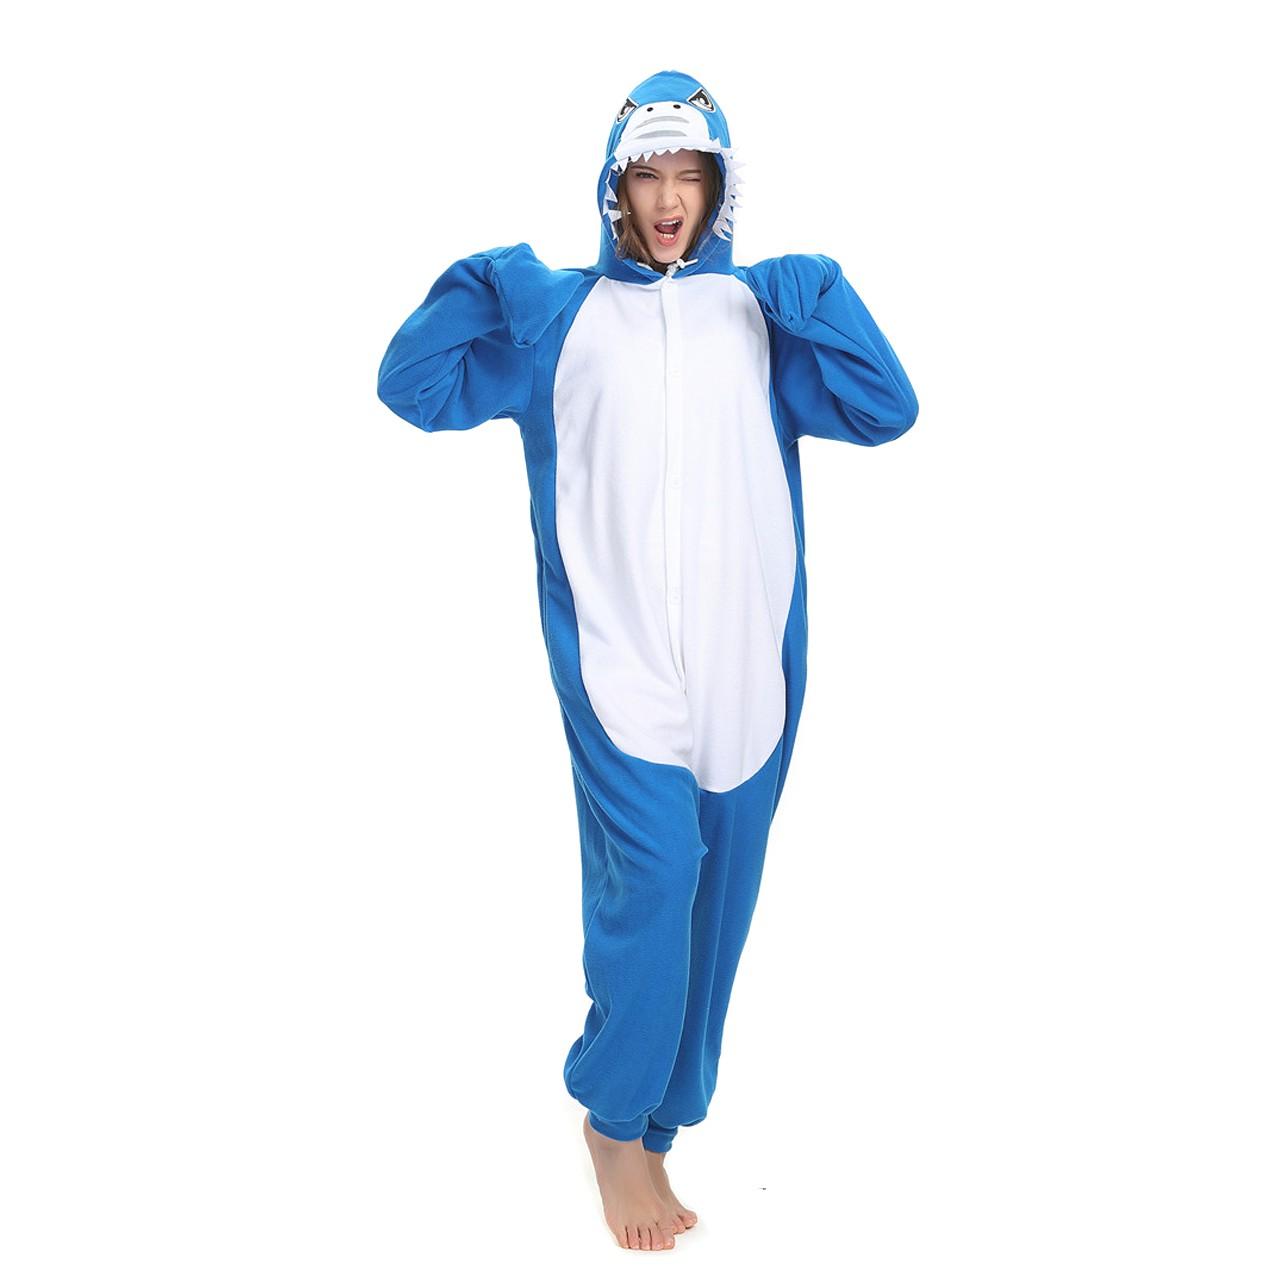 61c1bf45f Shark Onesie Animal Kigurumi Pajama for Adult Halloween Party Costumes